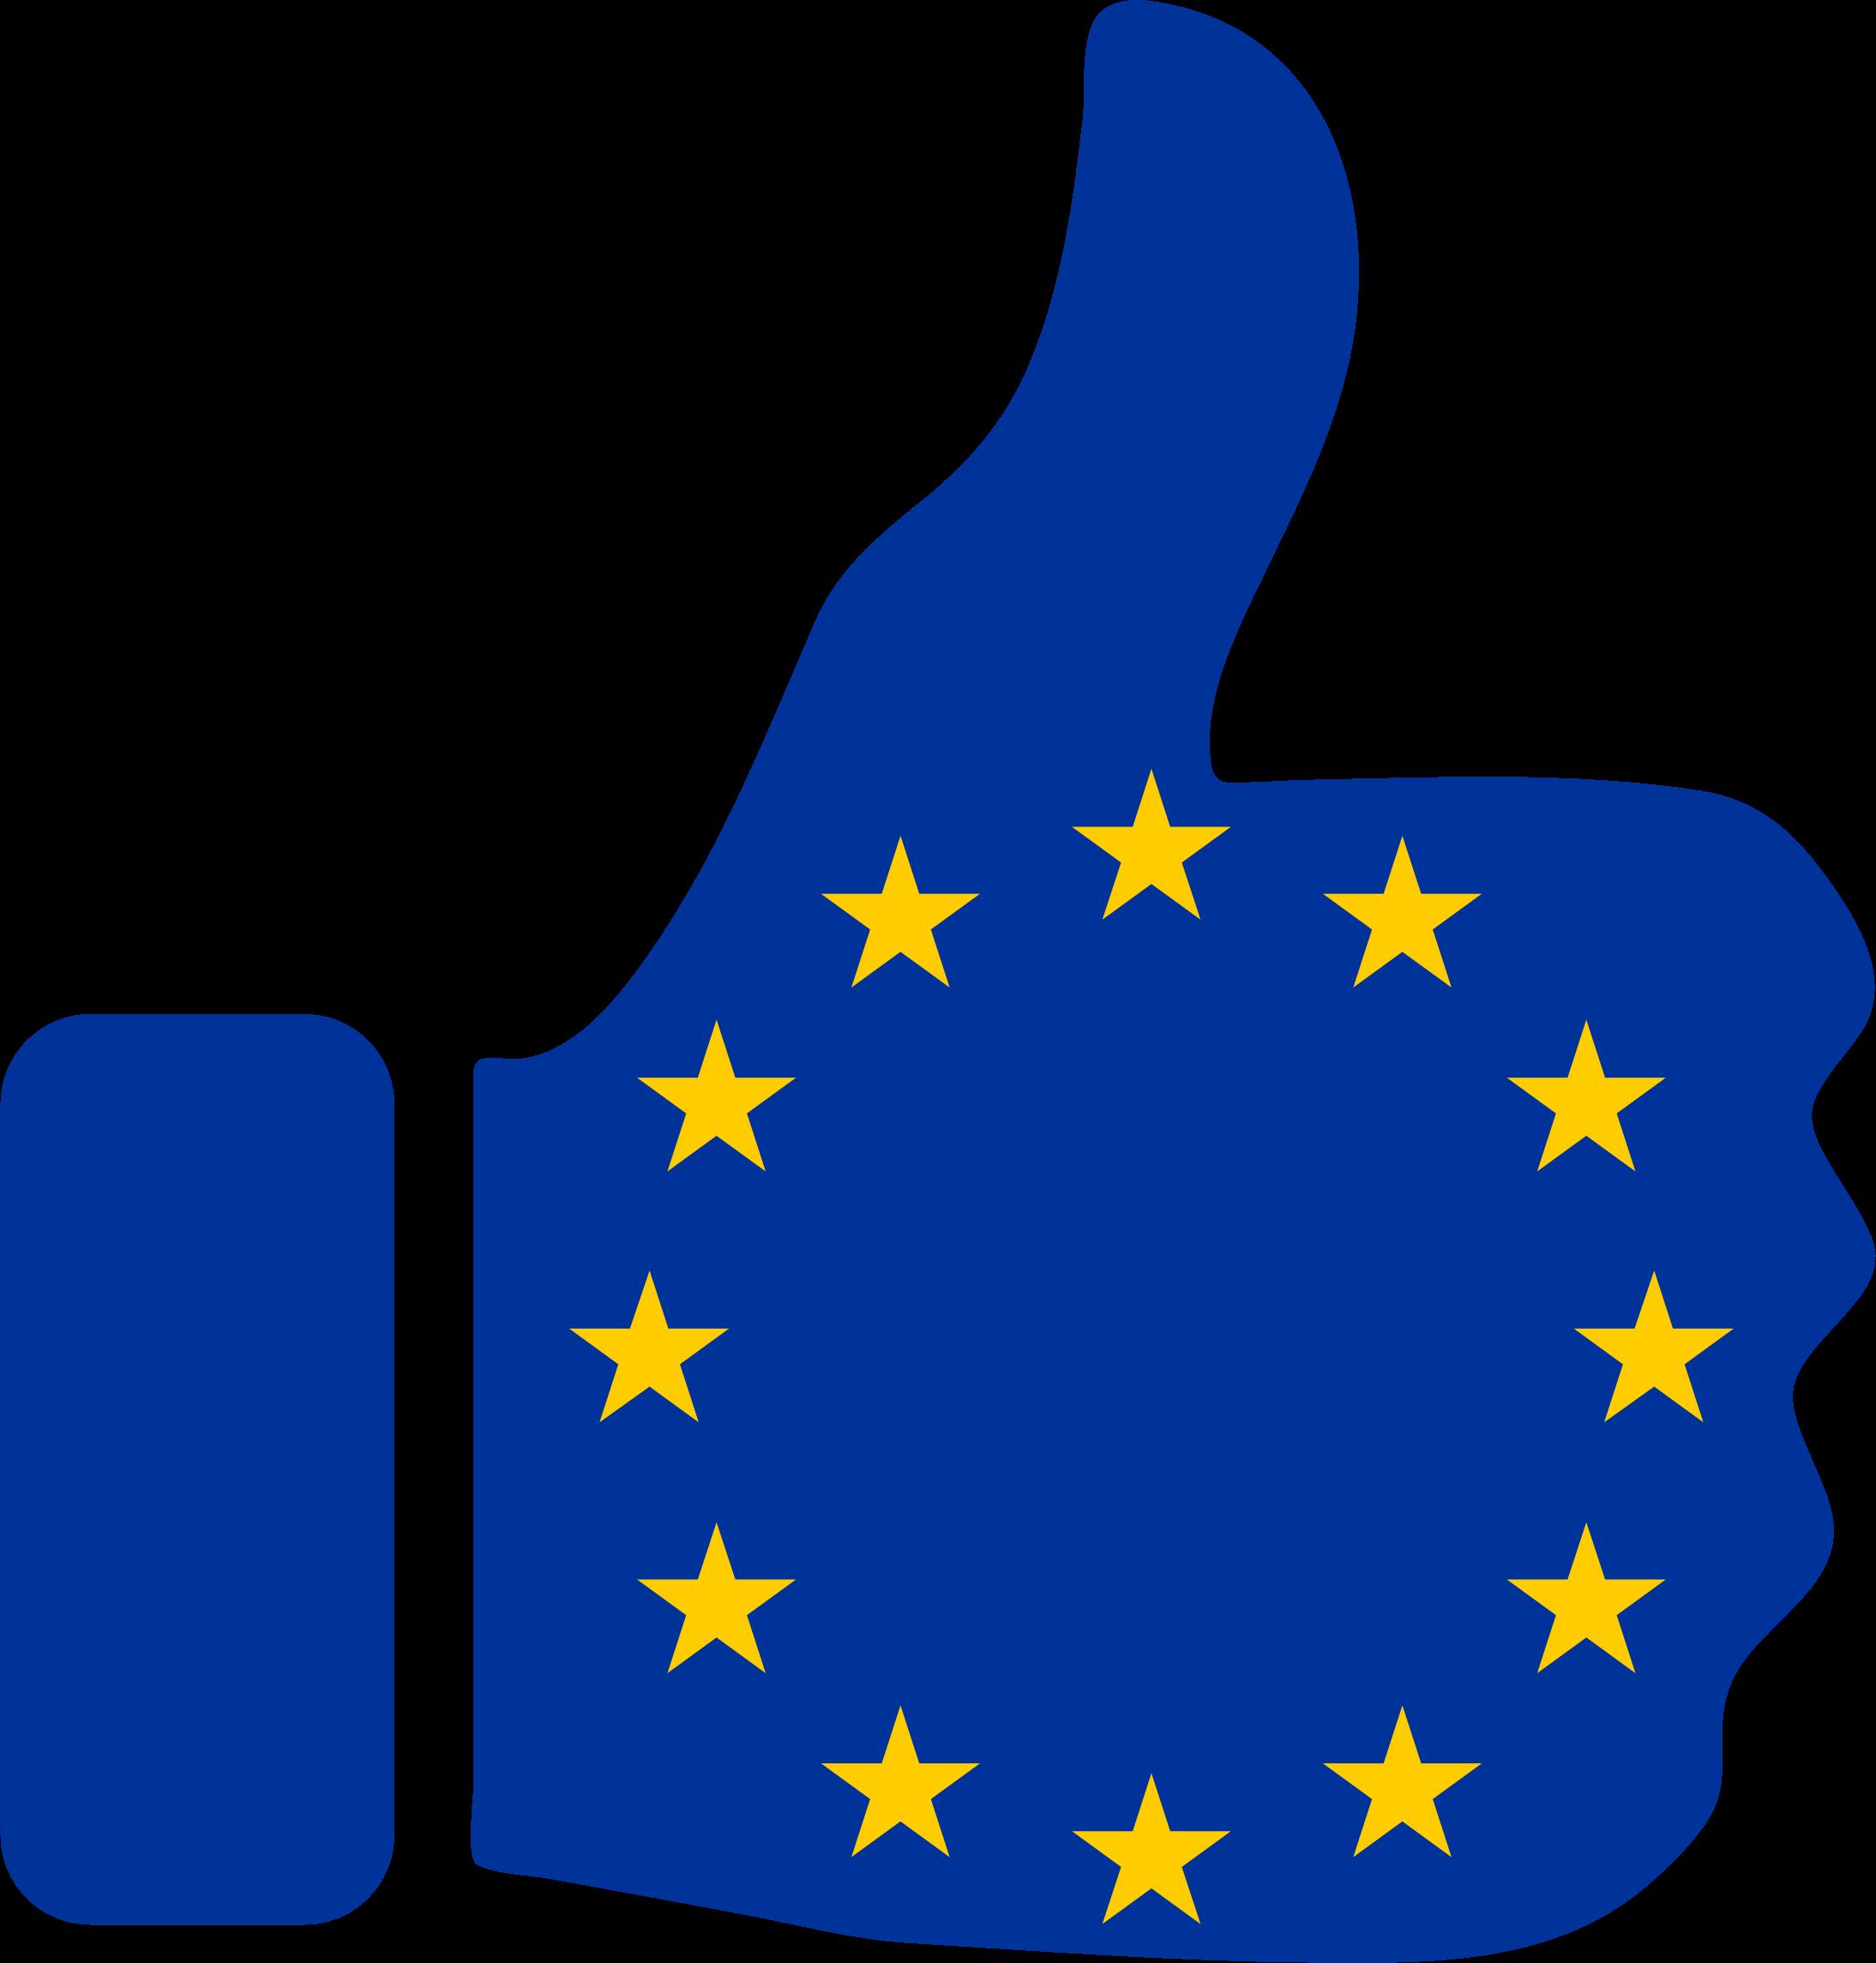 Europe clipart transparent. Thumbs up big image